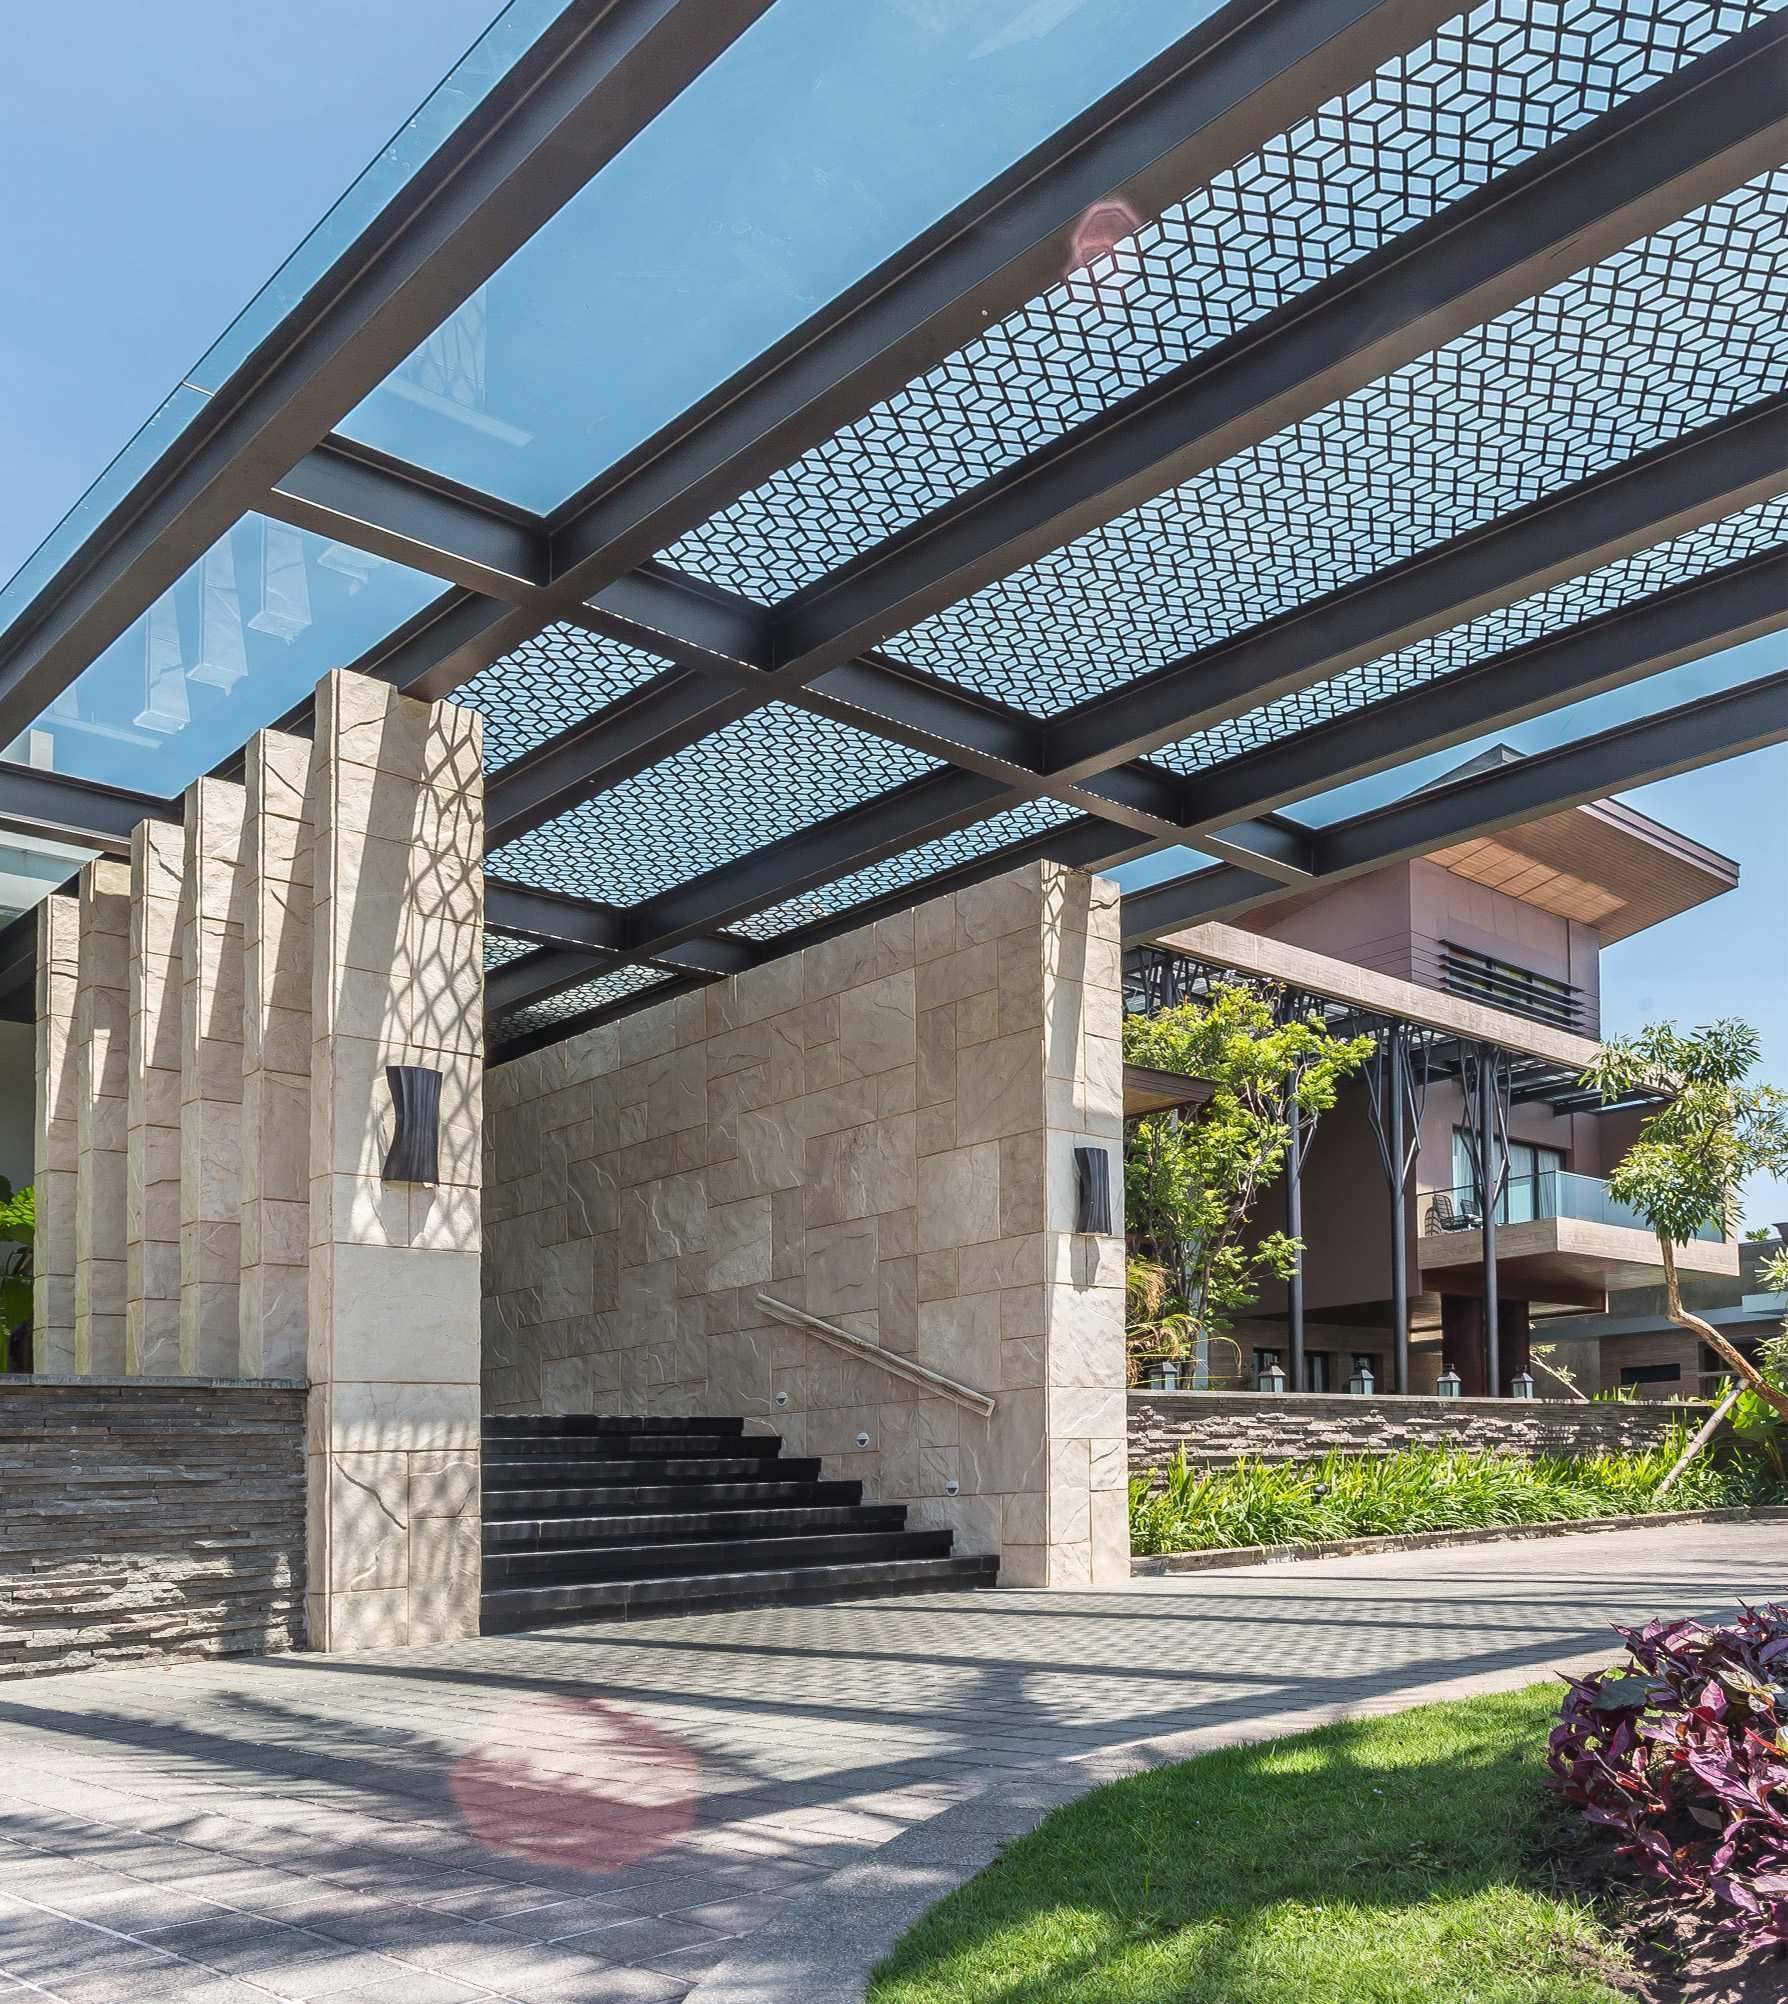 Lex And Architects Dipo Residence Jawa Tengah, Indonesia Jawa Tengah, Indonesia Lex-And-Architects-Dipo-Residence  68817